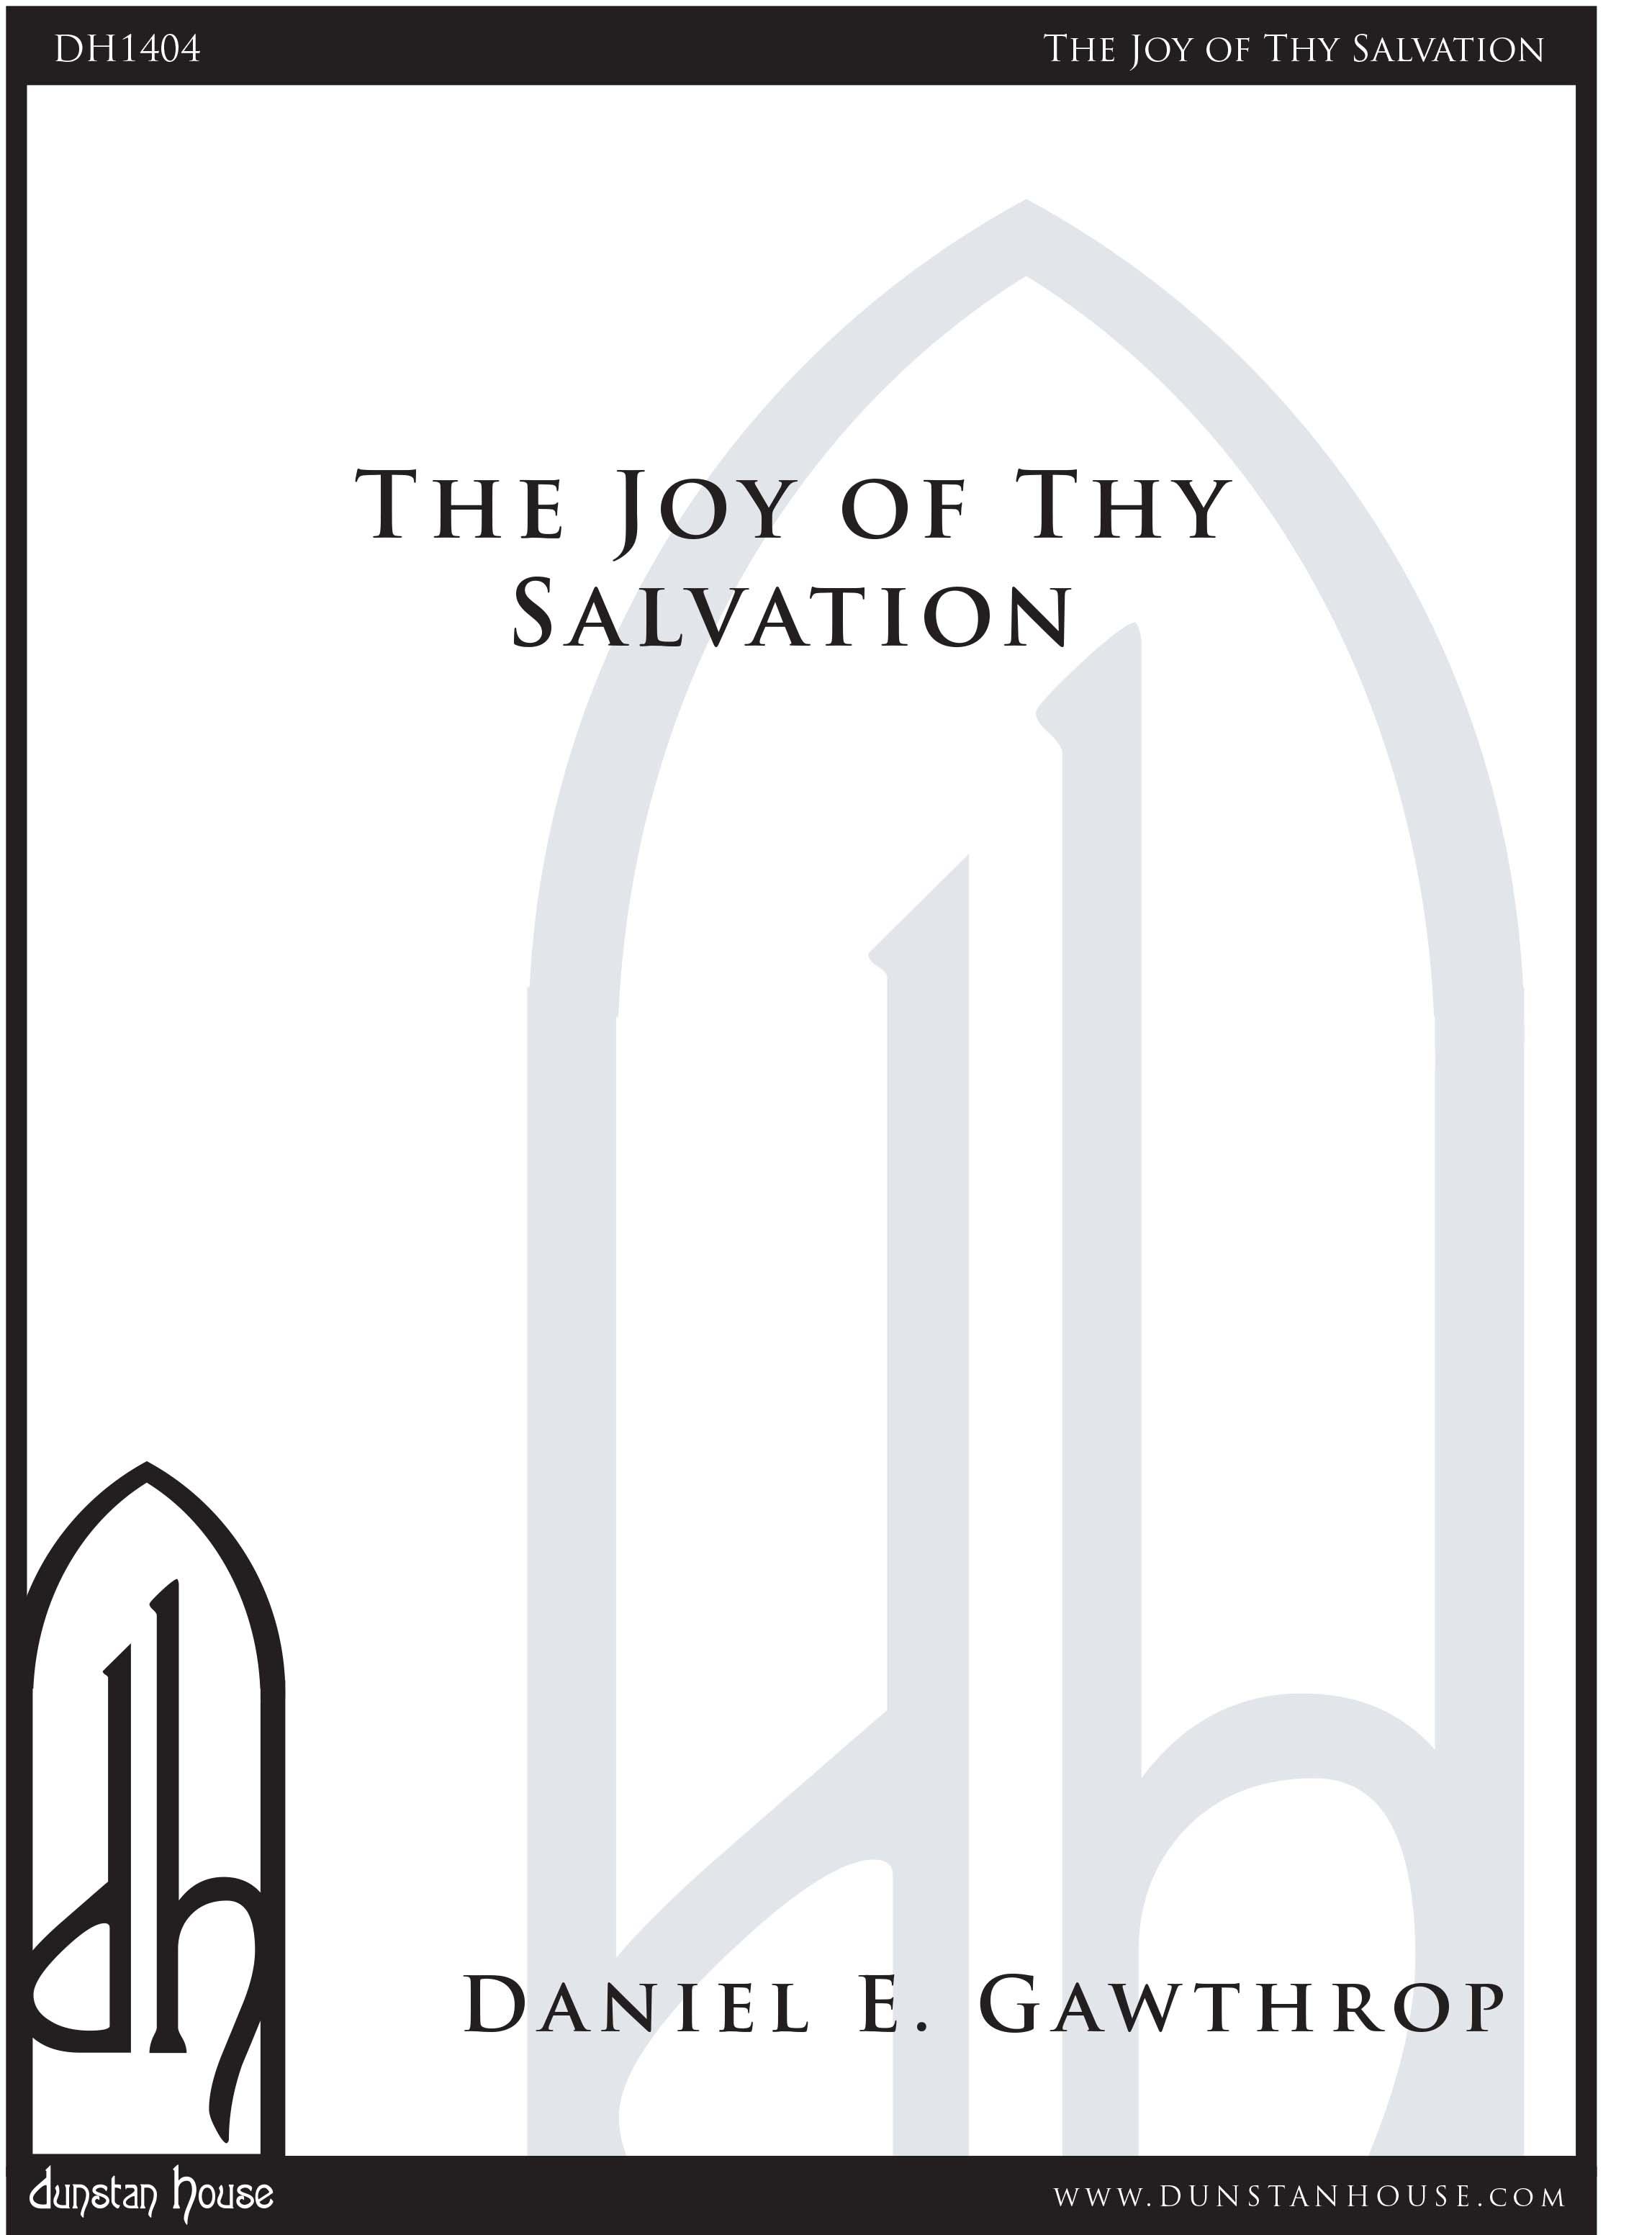 The Joy of Thy Salvation